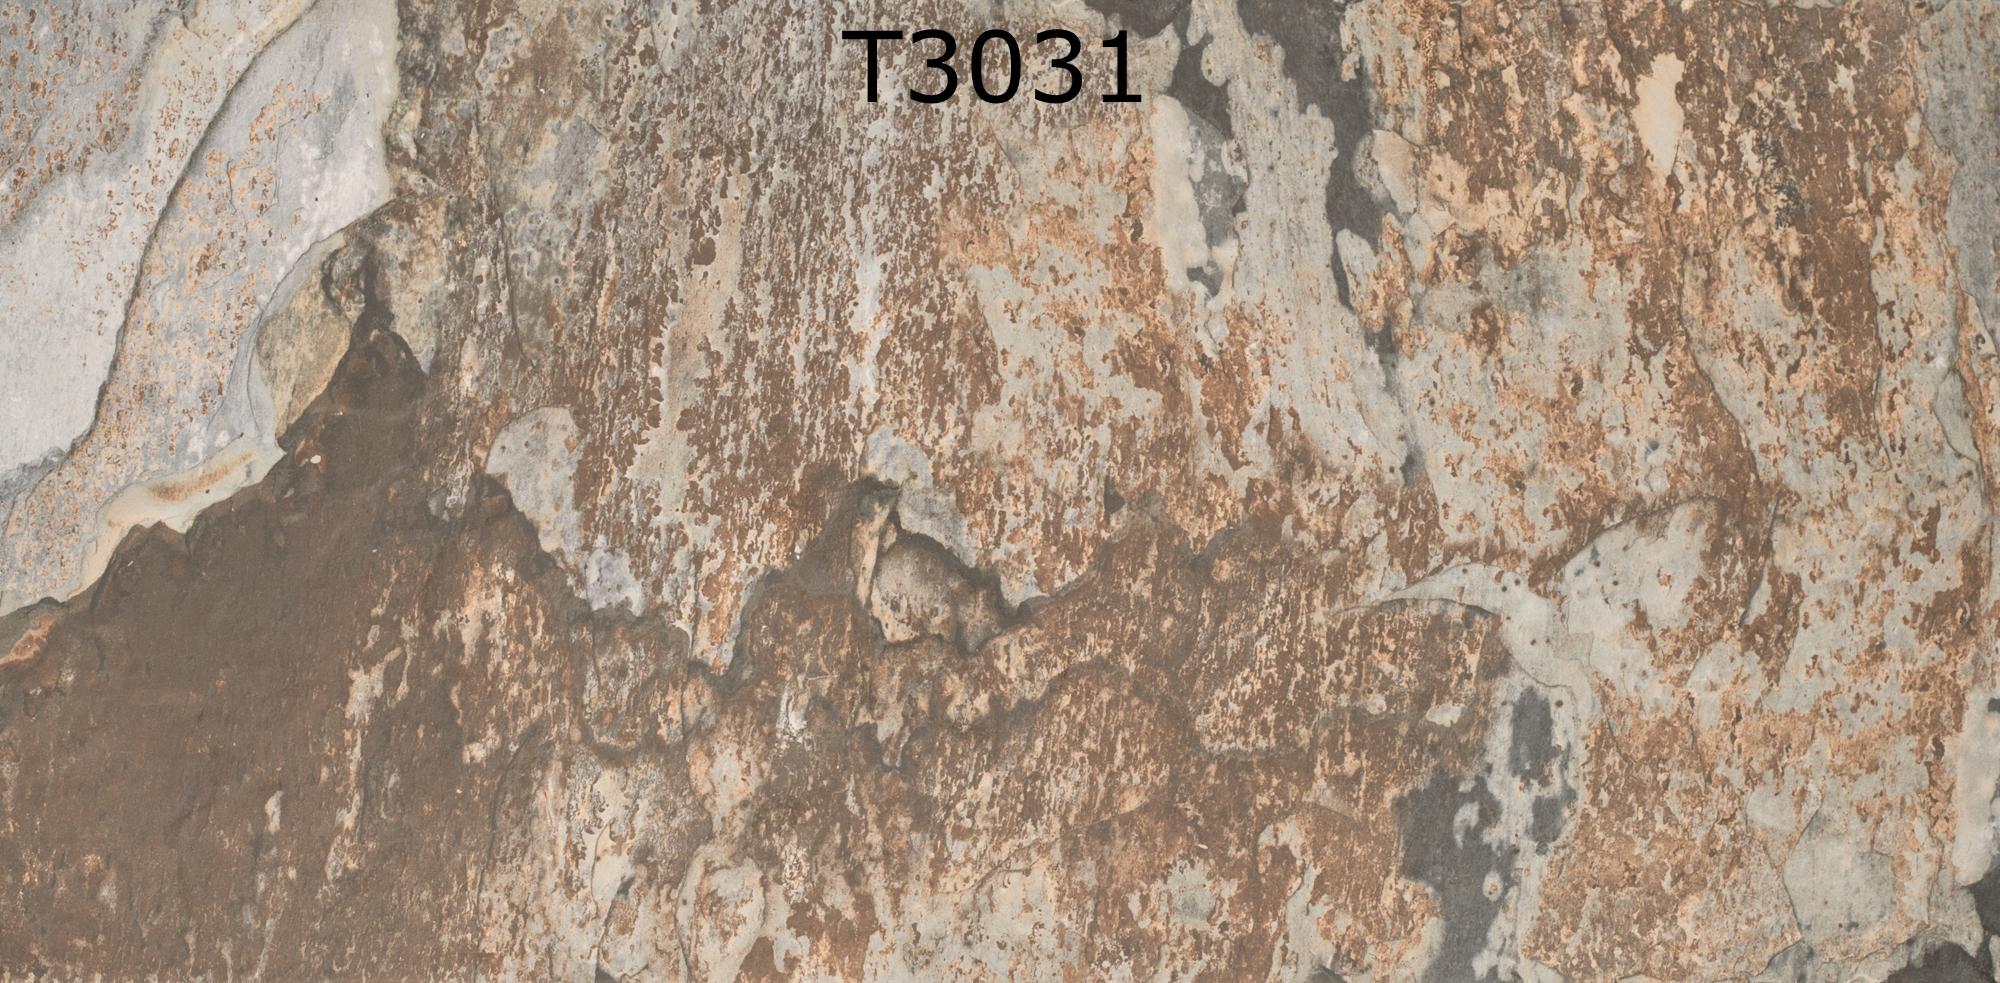 T3031